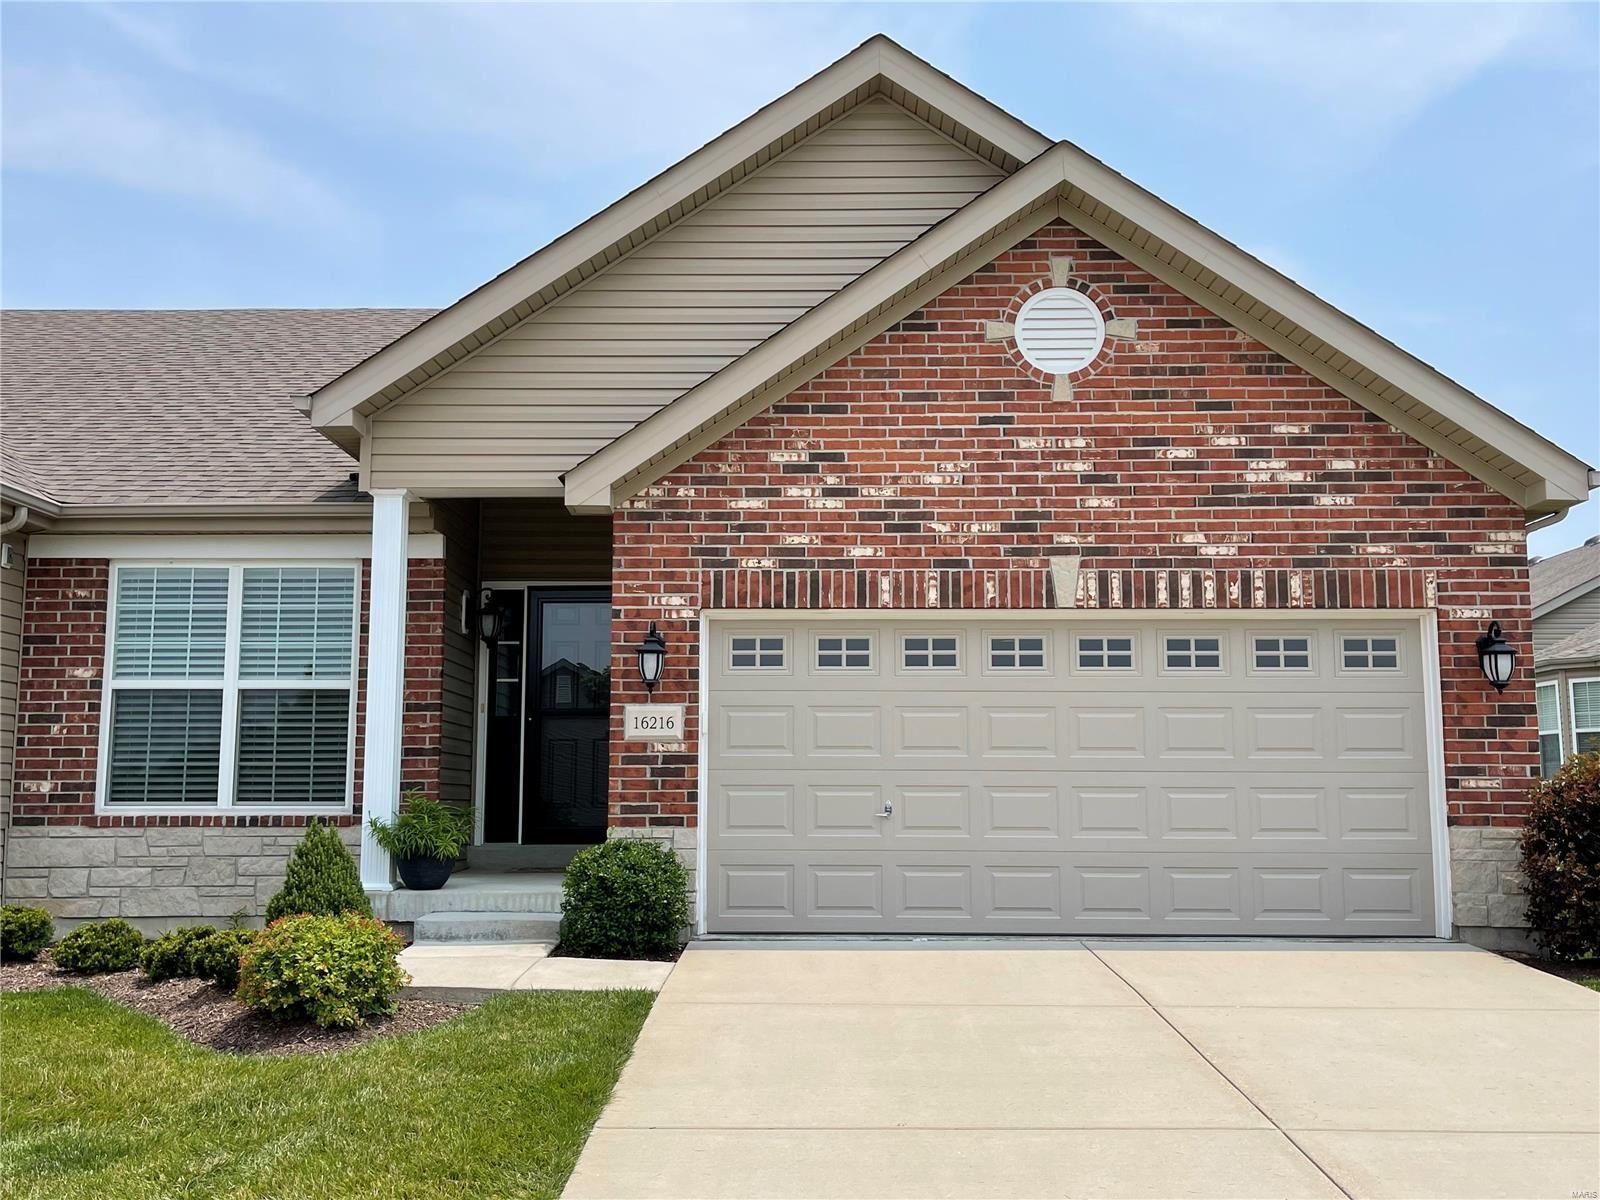 16216 Amber Vista Drive, Ellisville, MO 63021 - MLS#: 21058235